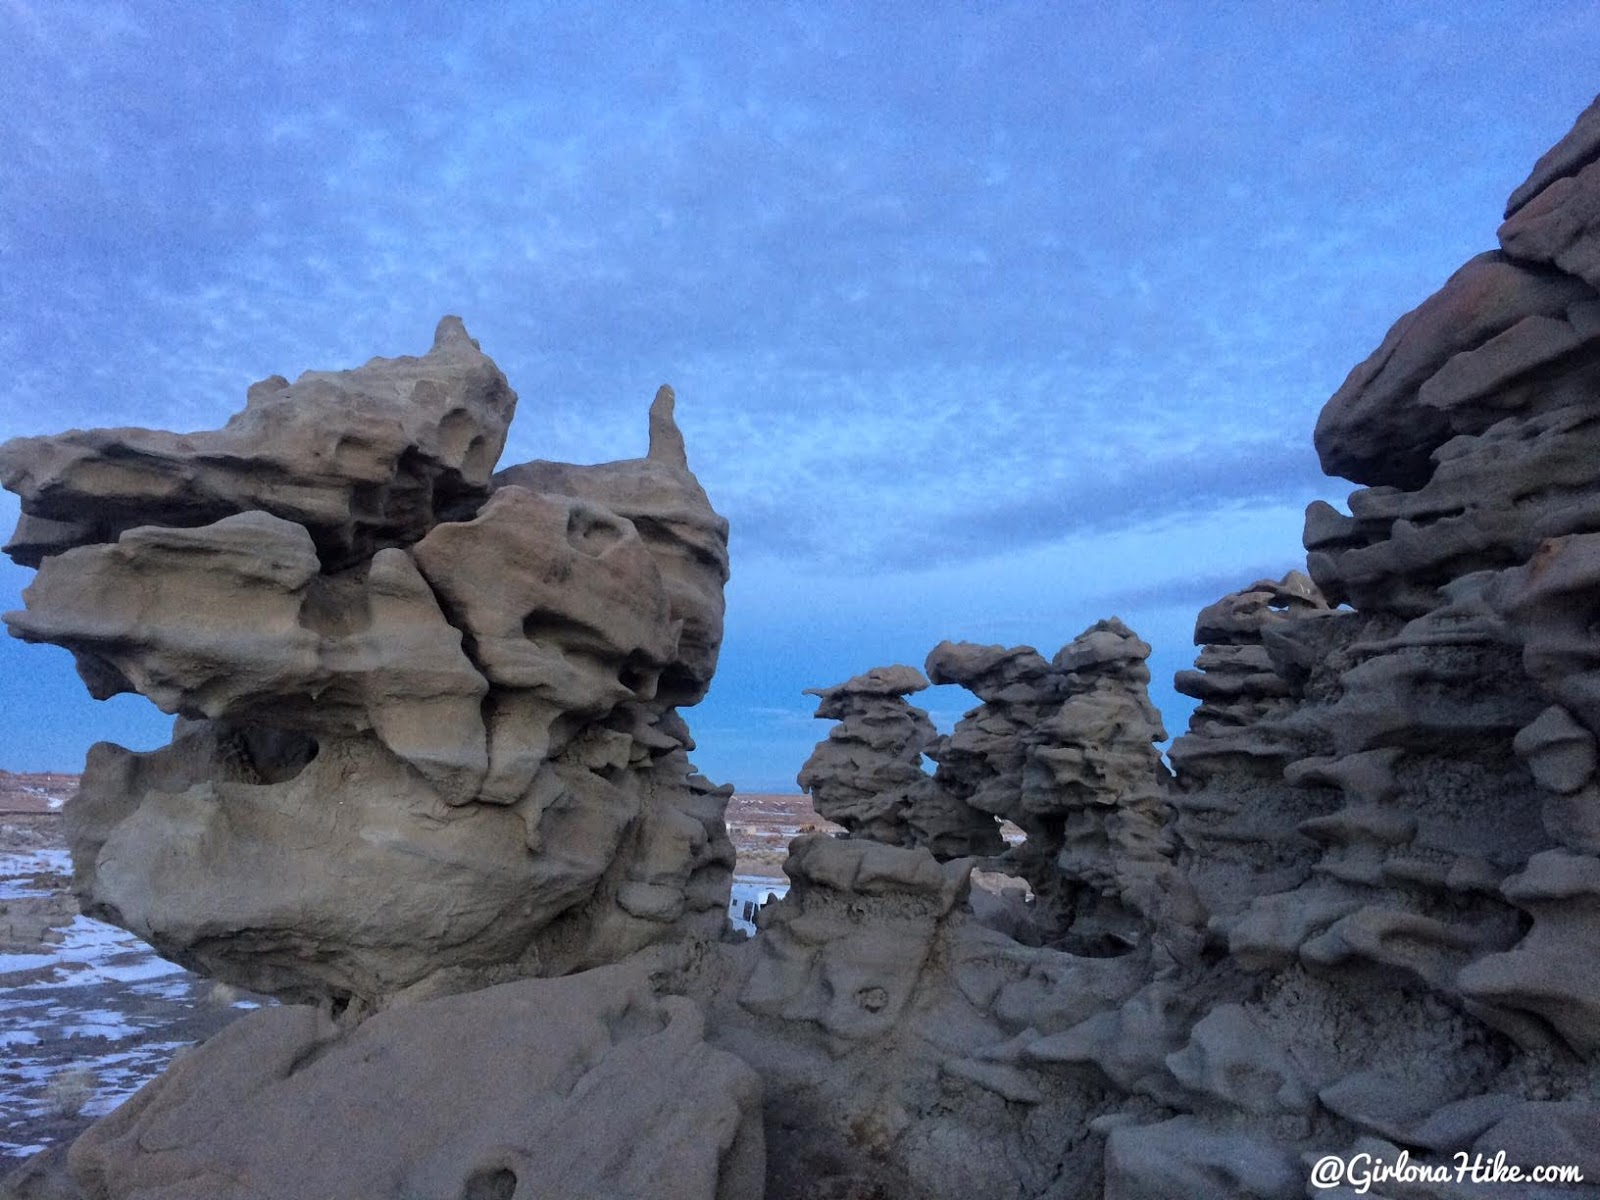 Exploring Fantasy Canyon, Vernal, Utah. Hiking in Utah with Dogs, Hiking in Utah with Kids, Camping near Vernal, UT